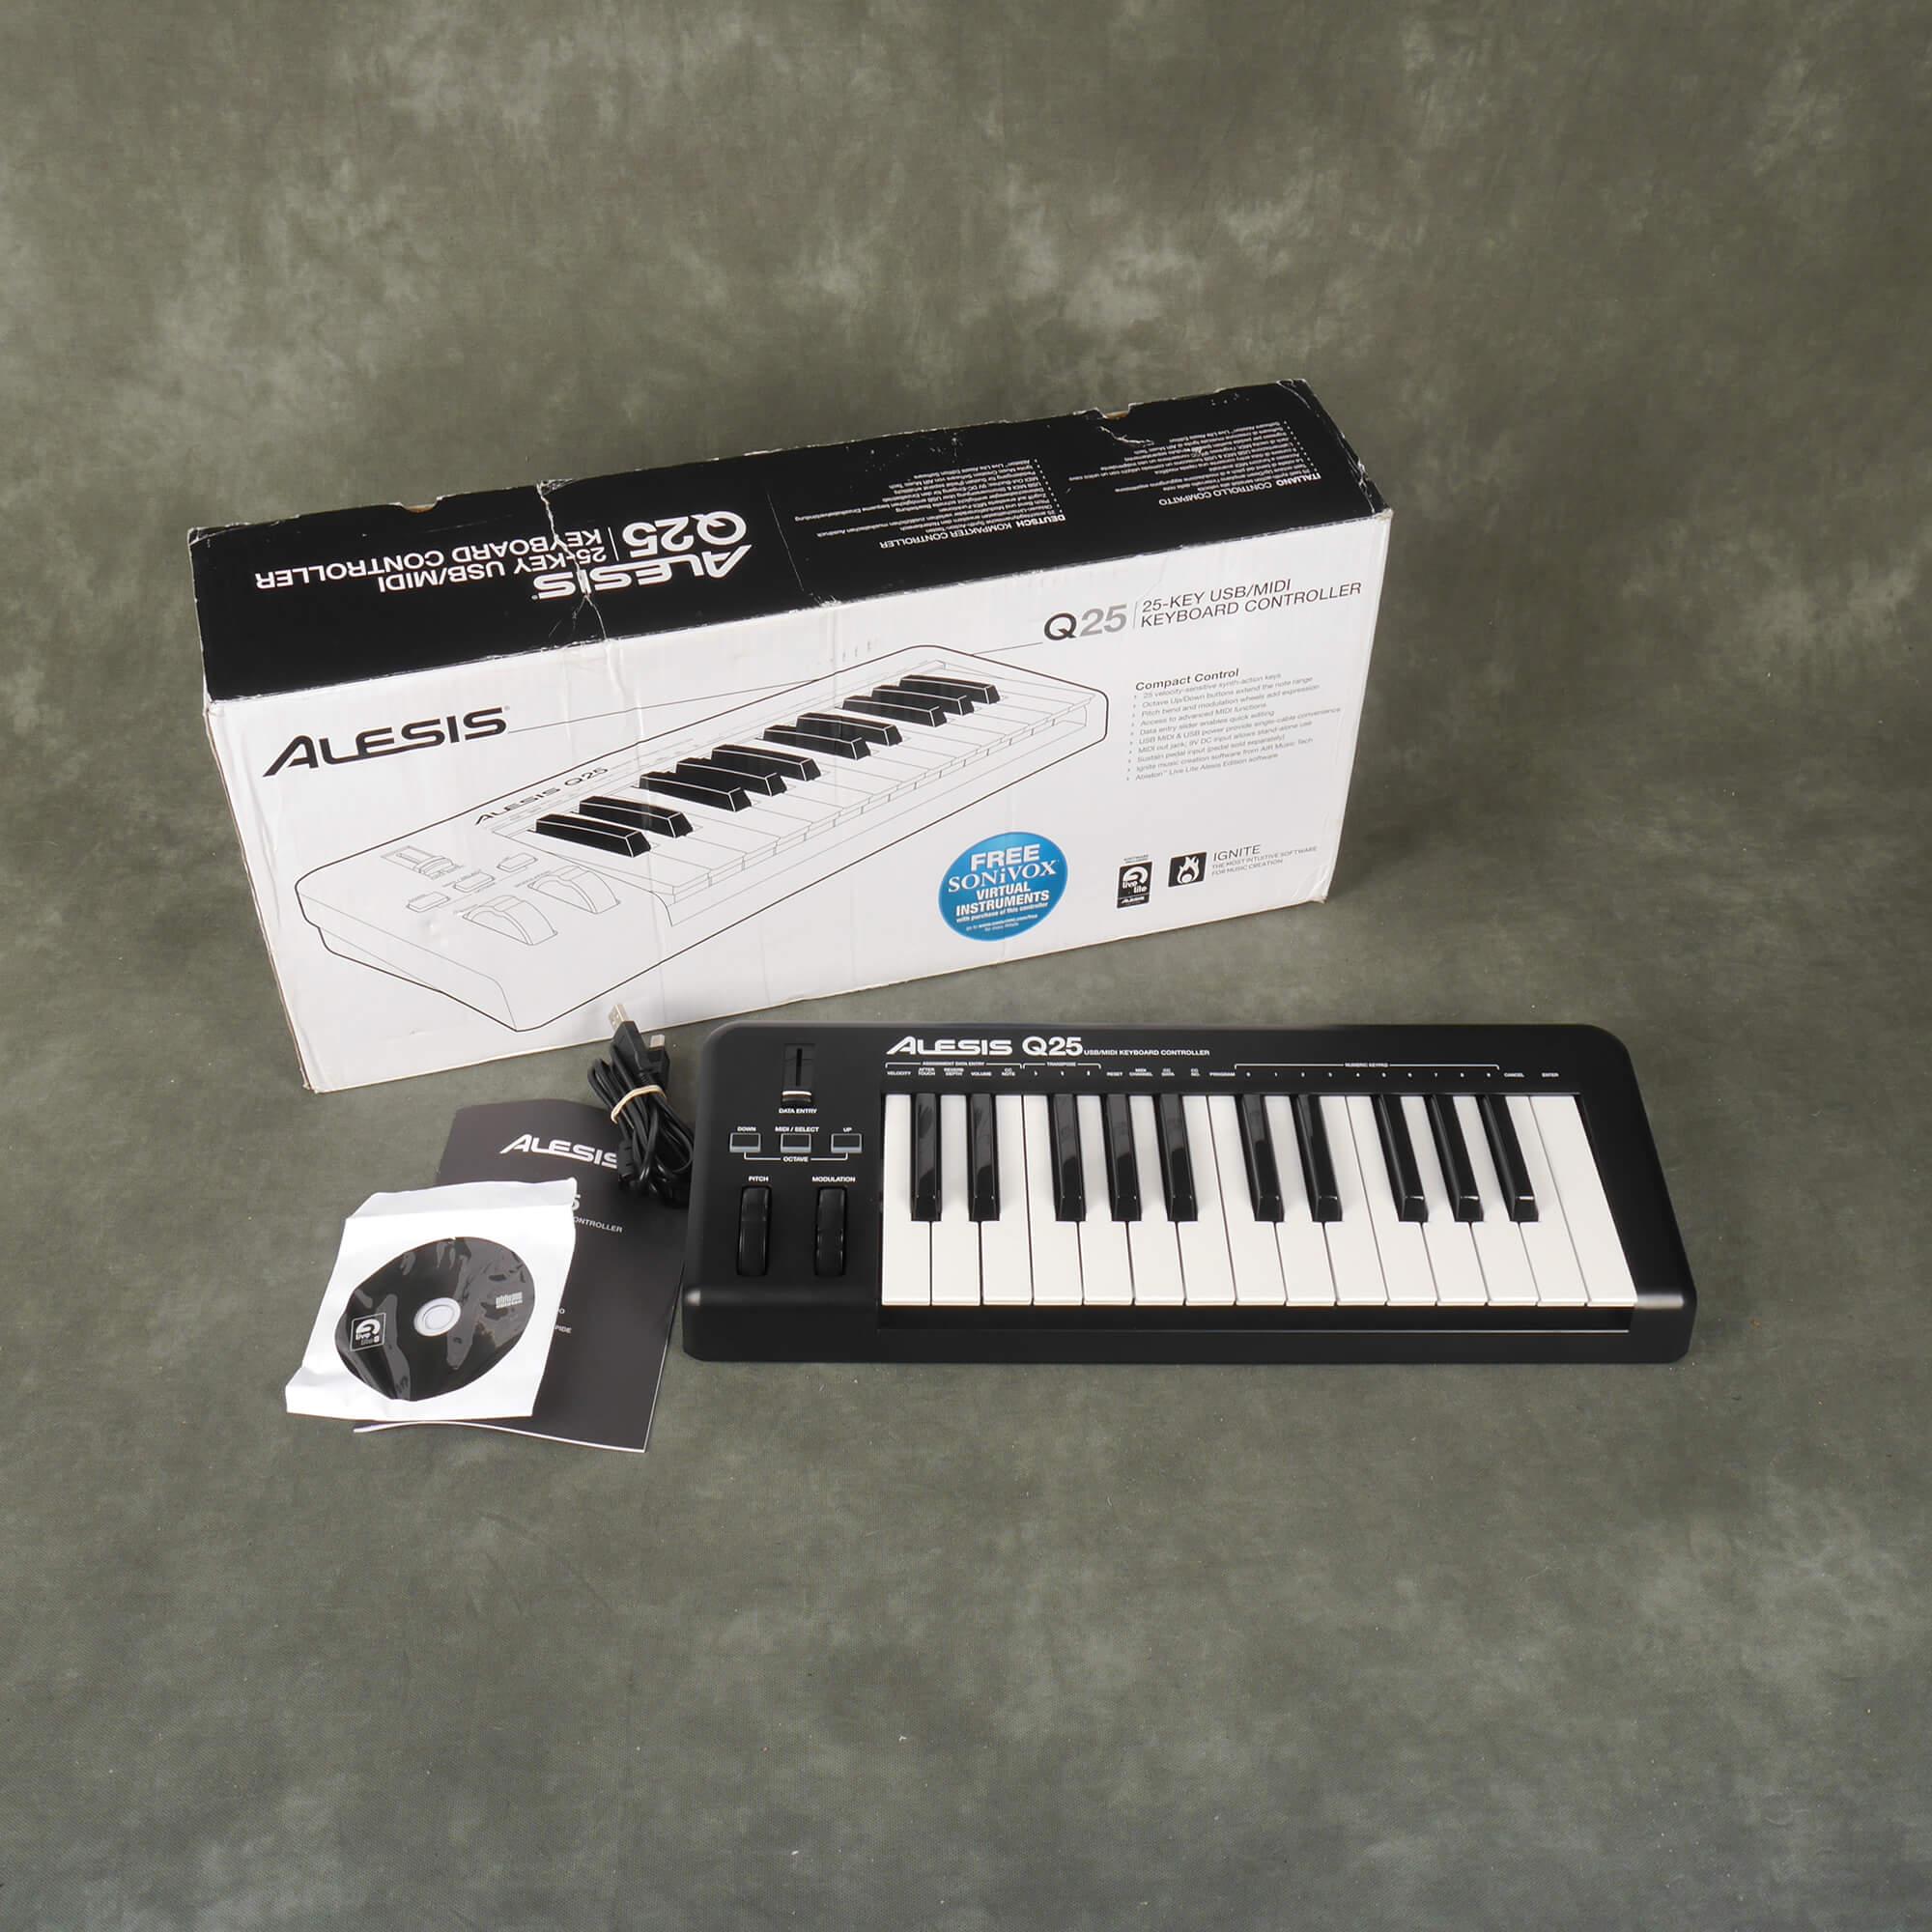 Alesis Q25 USB/MIDI Keyboard Controller w/Box & PSU - 2nd Hand